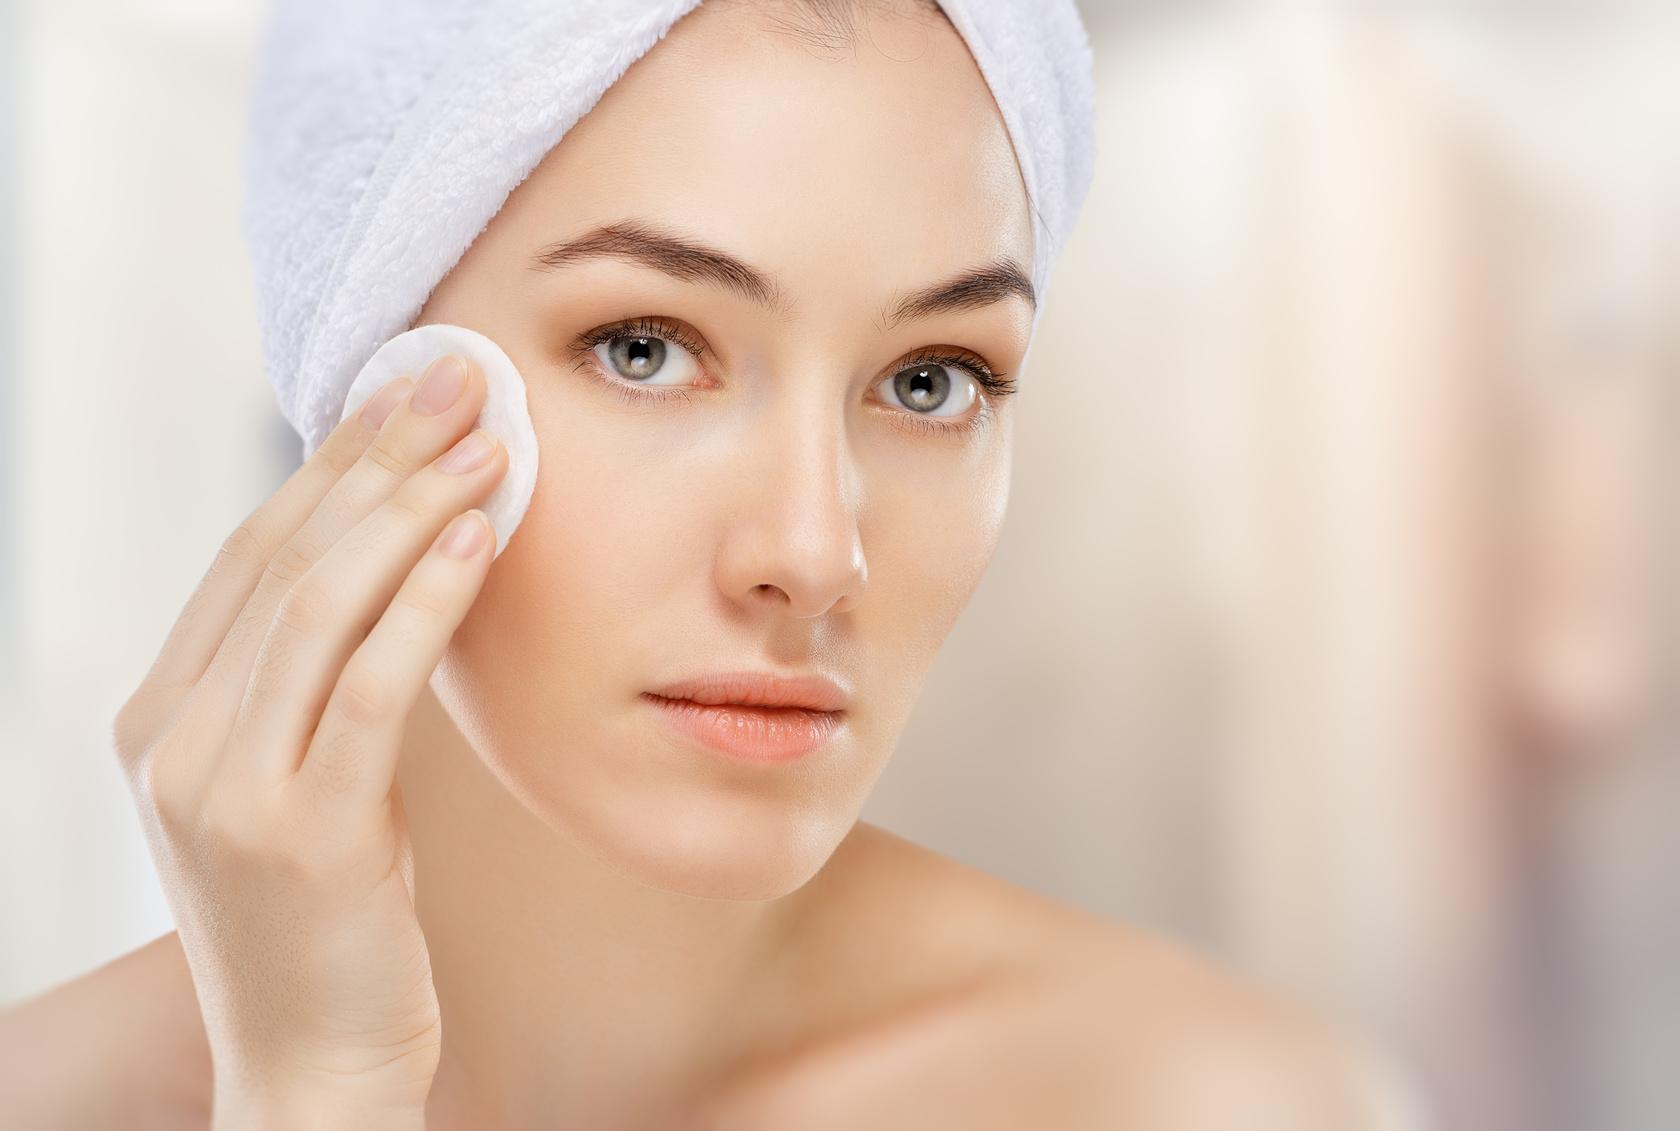 rutina hidratacion dermatologia estetica